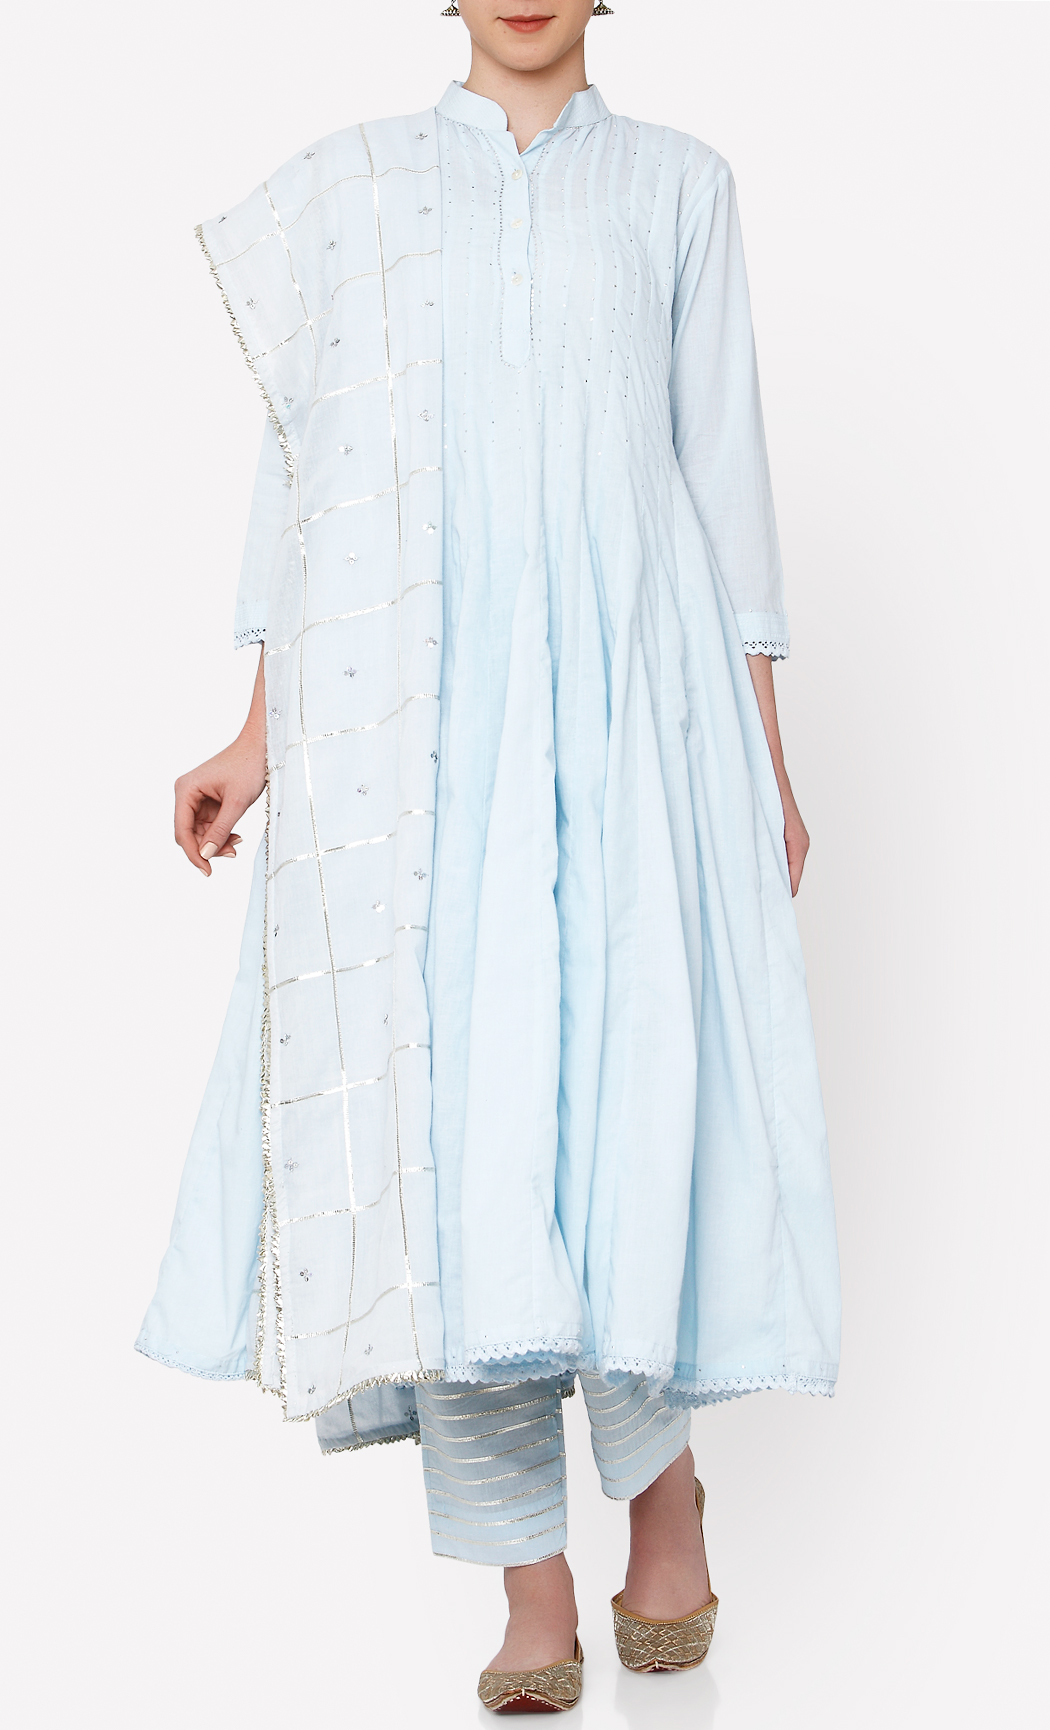 Zubeida Powder Blue Kurta and Pants Set. Buy Online.